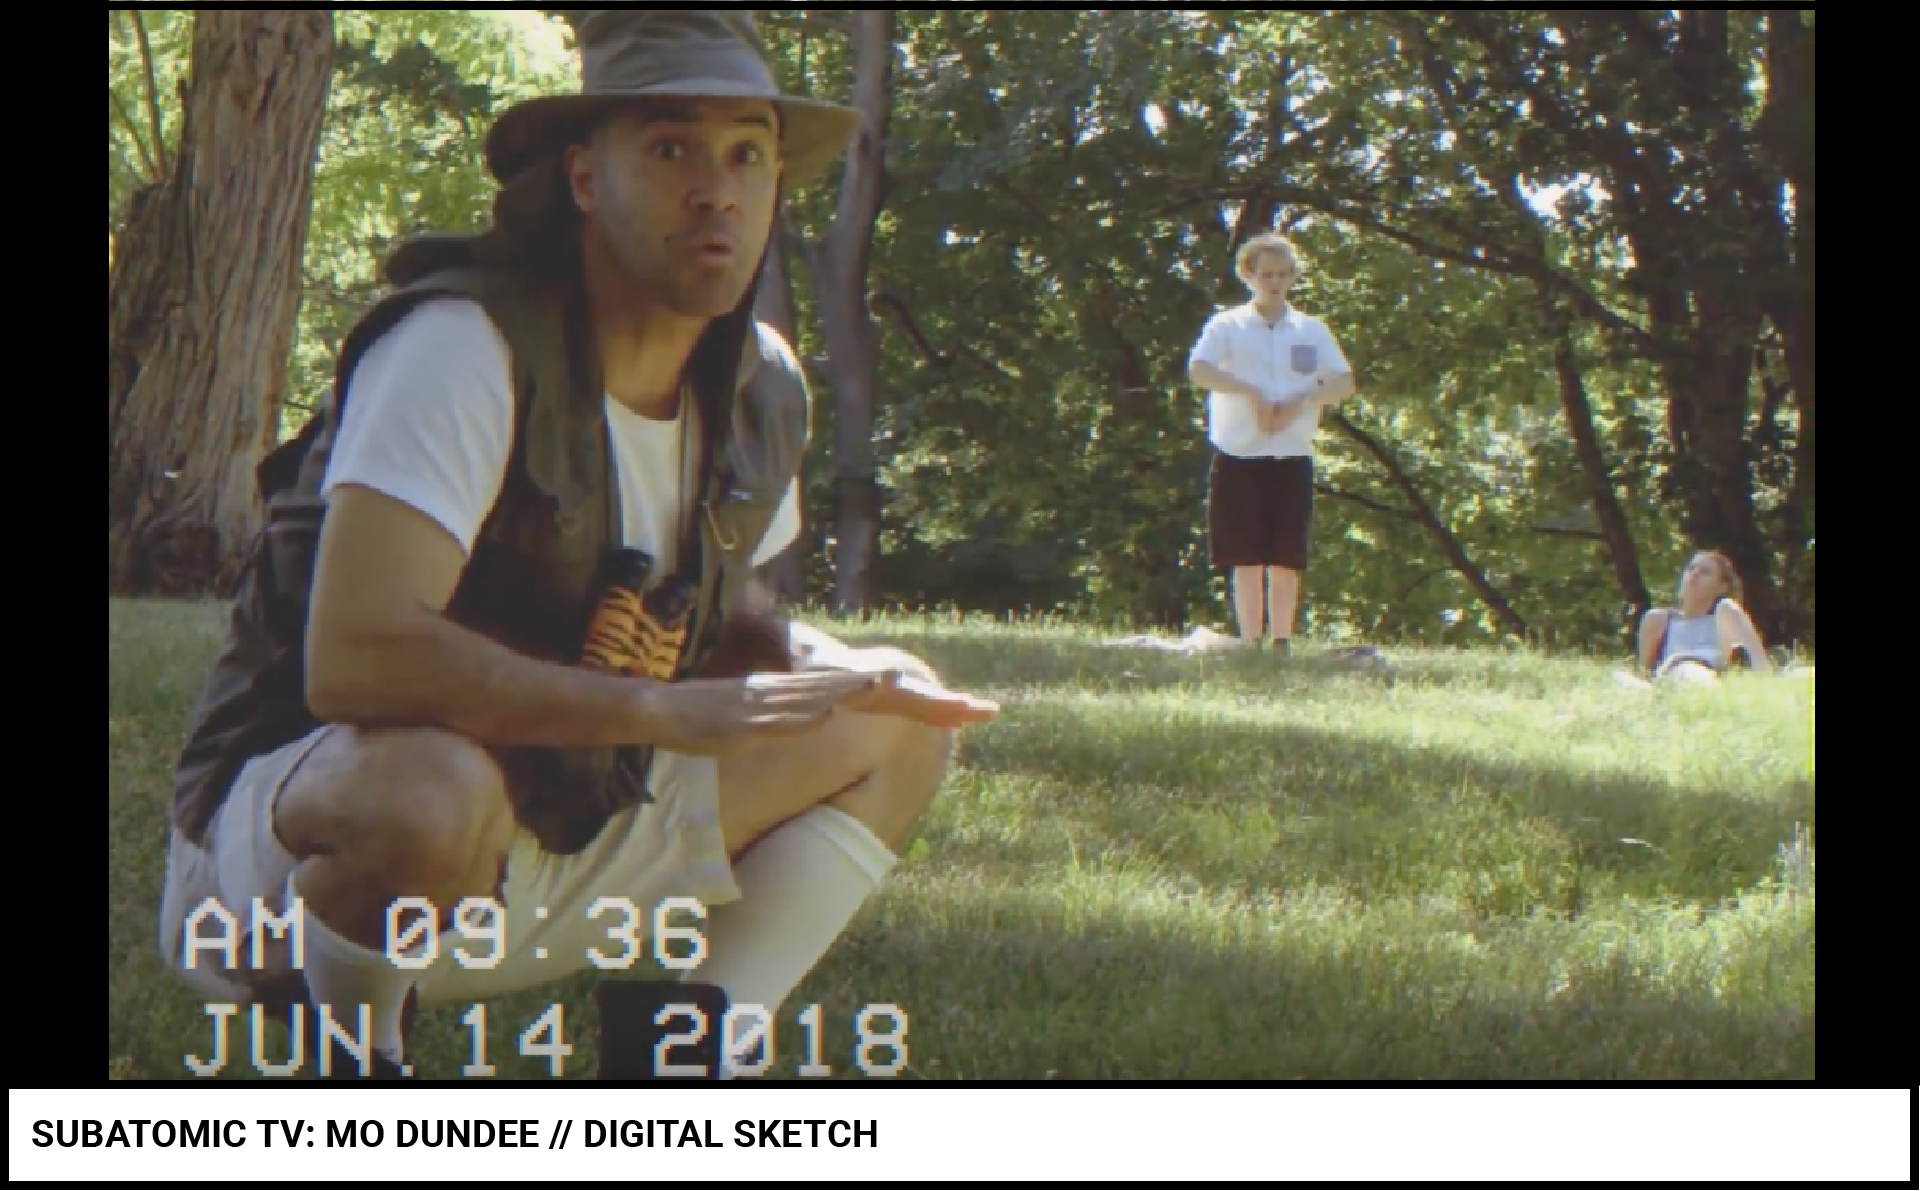 04_Mo-Dundee-Subatomic-TV_digital-Sketch.png